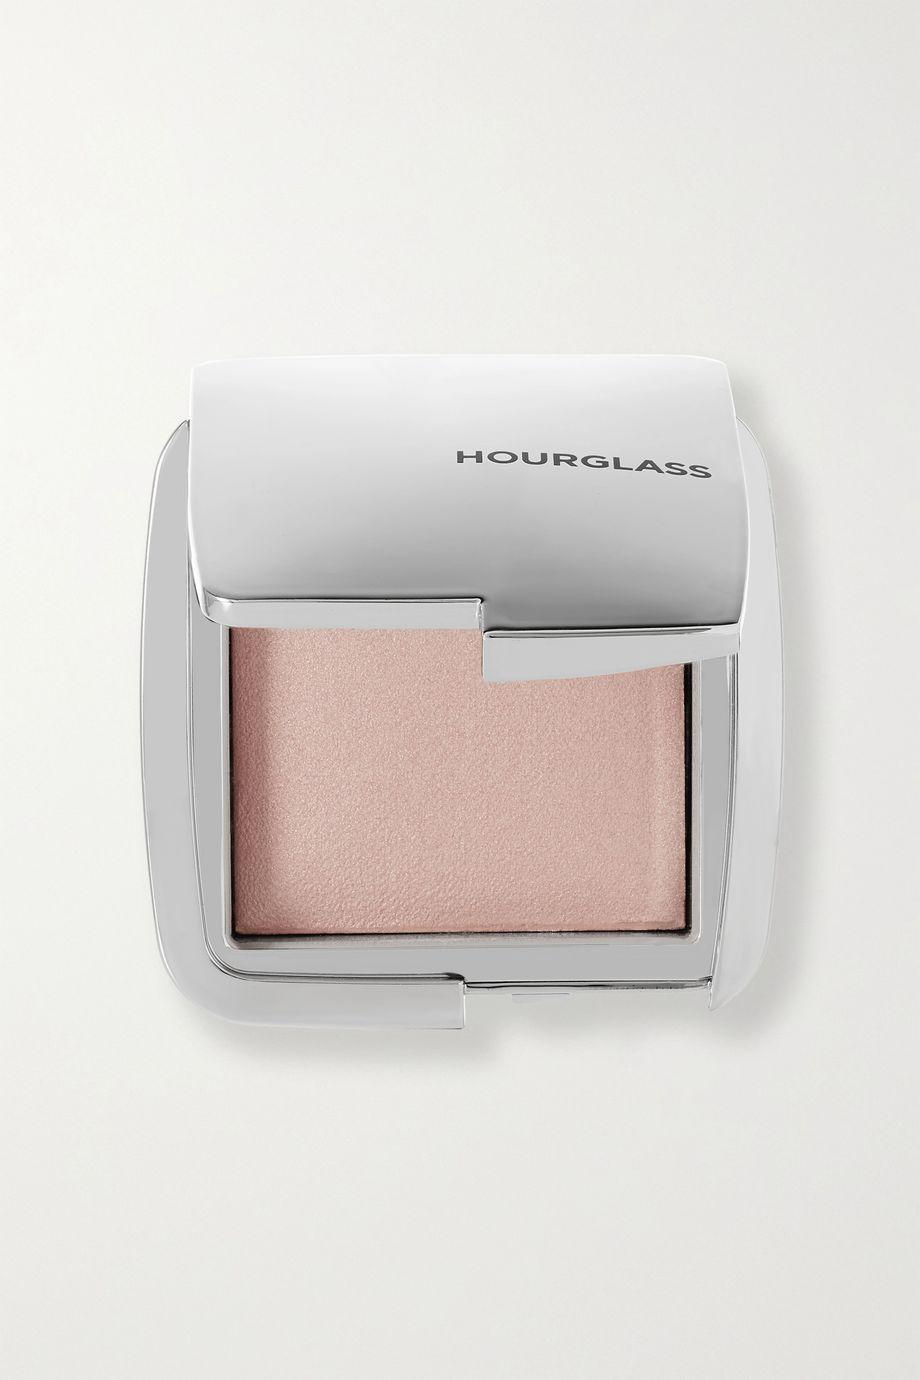 Hourglass Poudre illuminatrice Ambient® Strobe, Iridescent Strobe Light